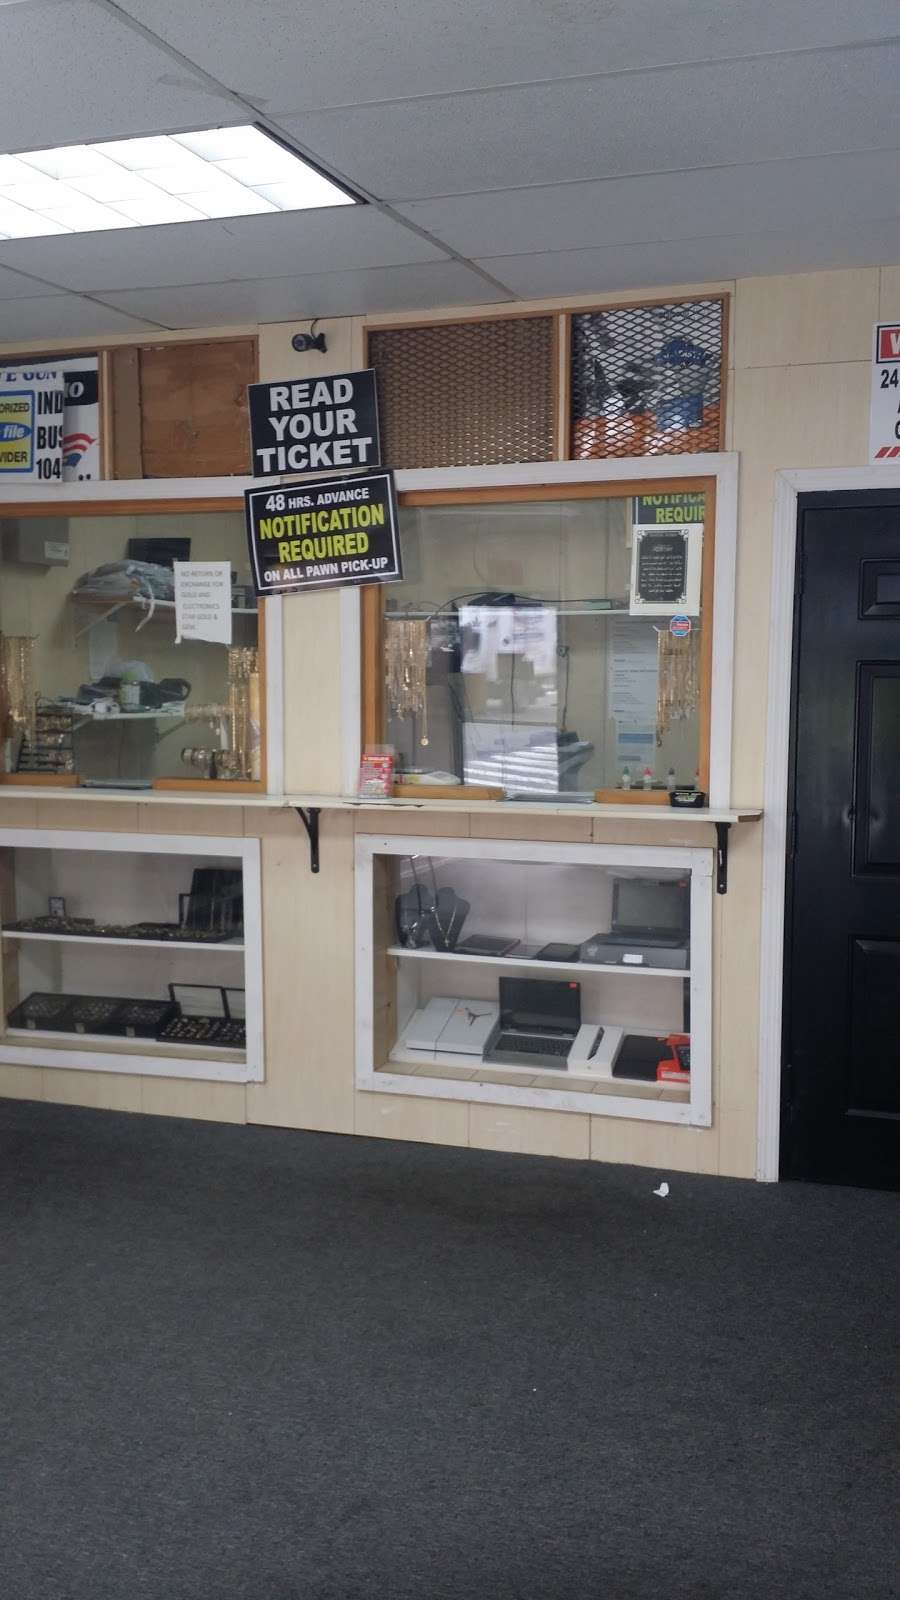 STAR GOLD & GEM - store  | Photo 4 of 10 | Address: 400 E Gun Hill Rd, Bronx, NY 10467, USA | Phone: (347) 346-4080